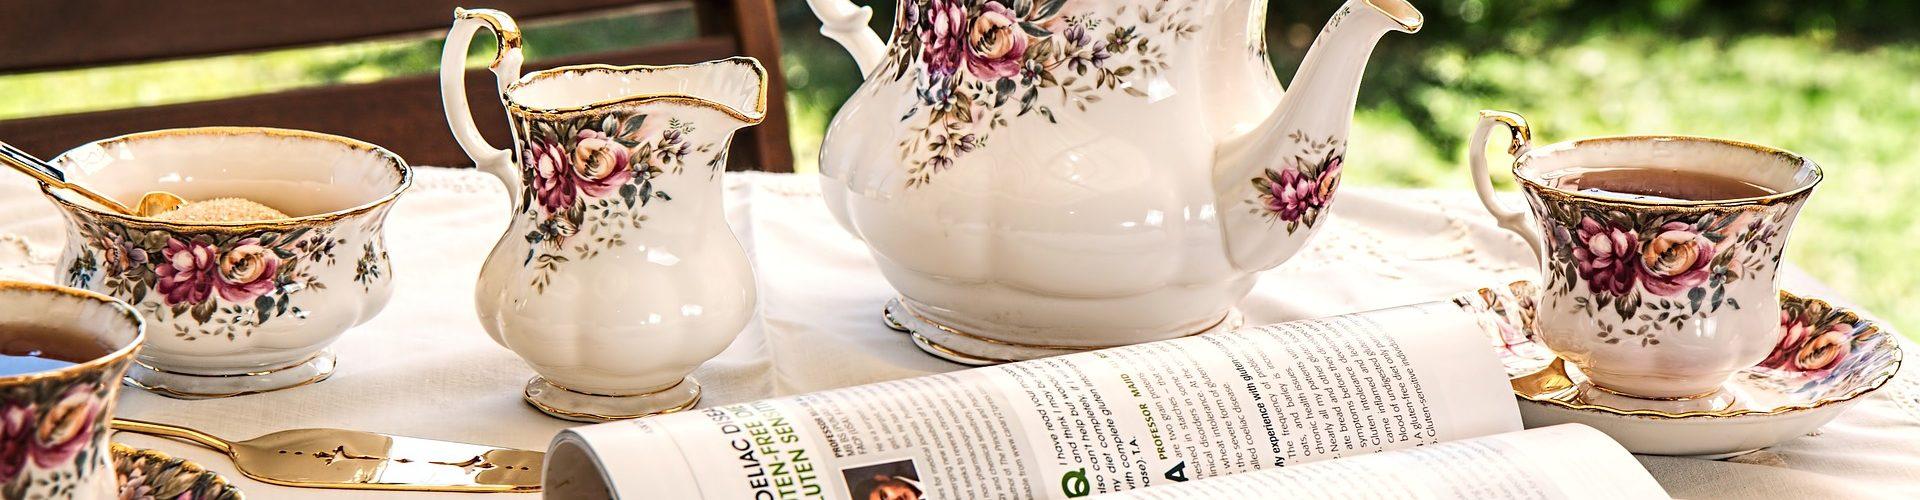 Norfolk Tea Stop - Locations Across Norfolk - Afternoon Tea - Coffee - Cake - Sandwiches